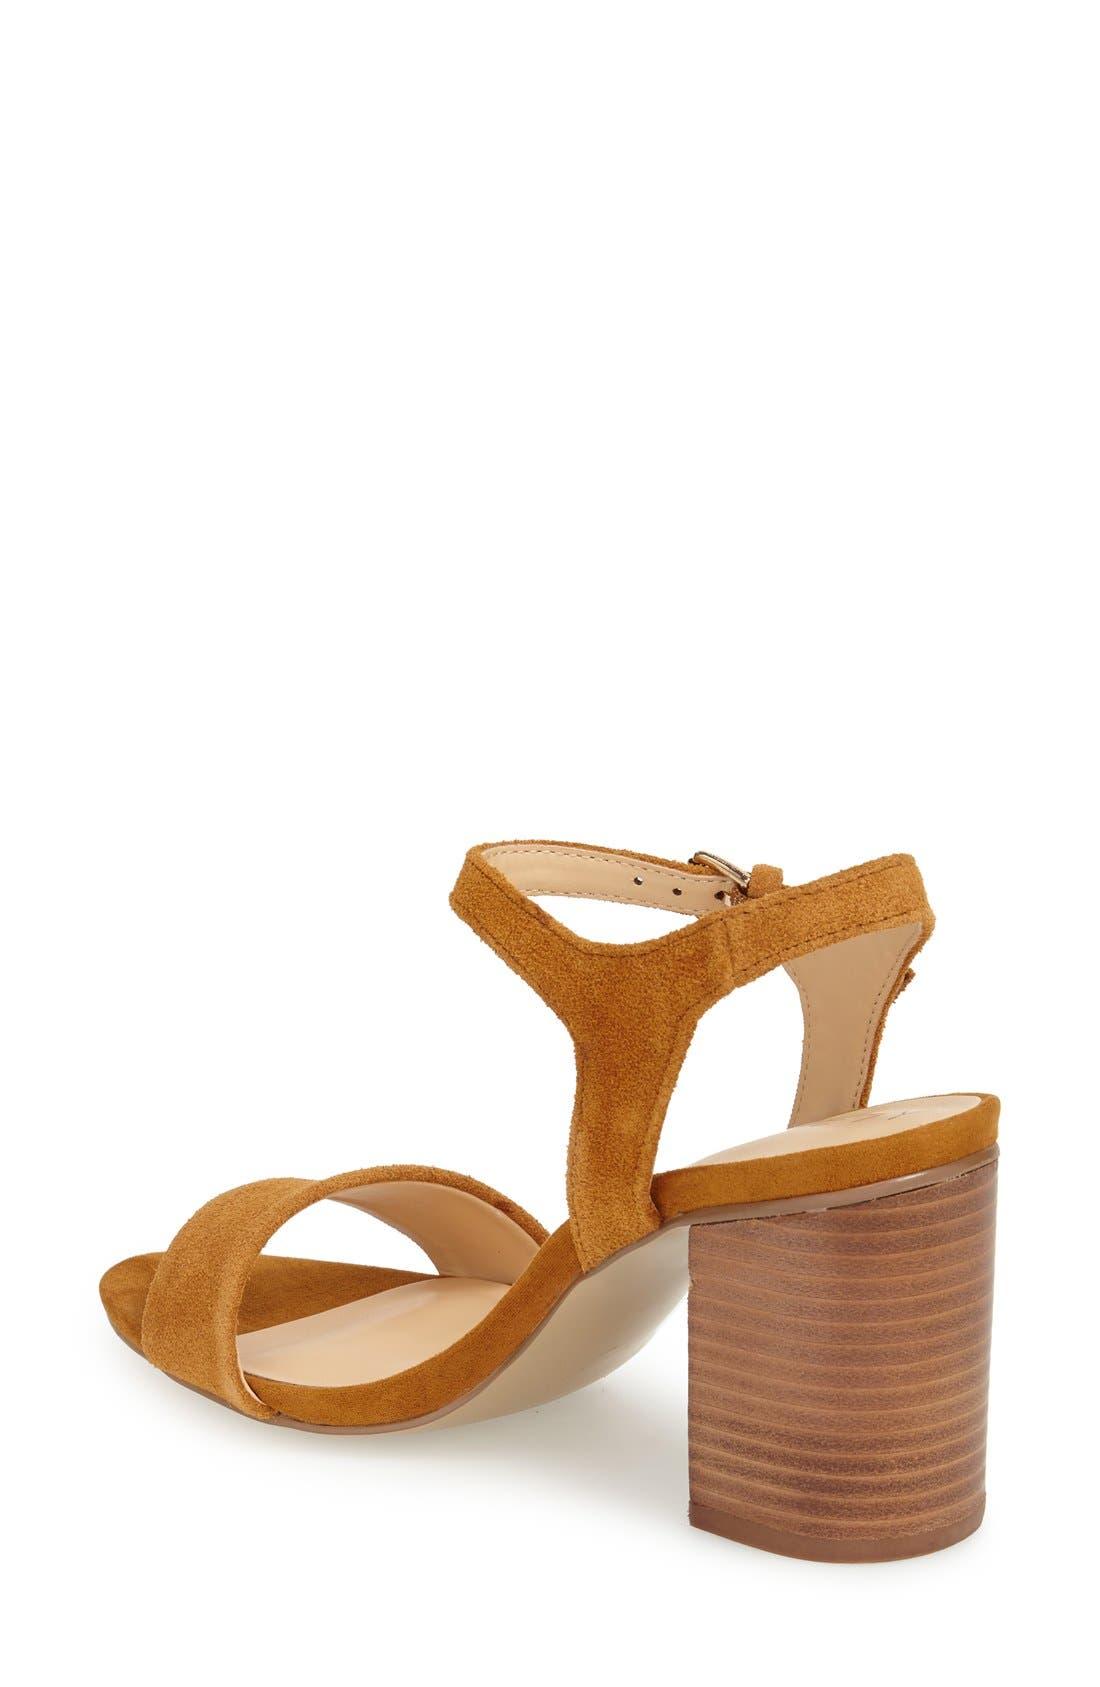 'Linny' Ankle Strap Sandal,                             Alternate thumbnail 19, color,